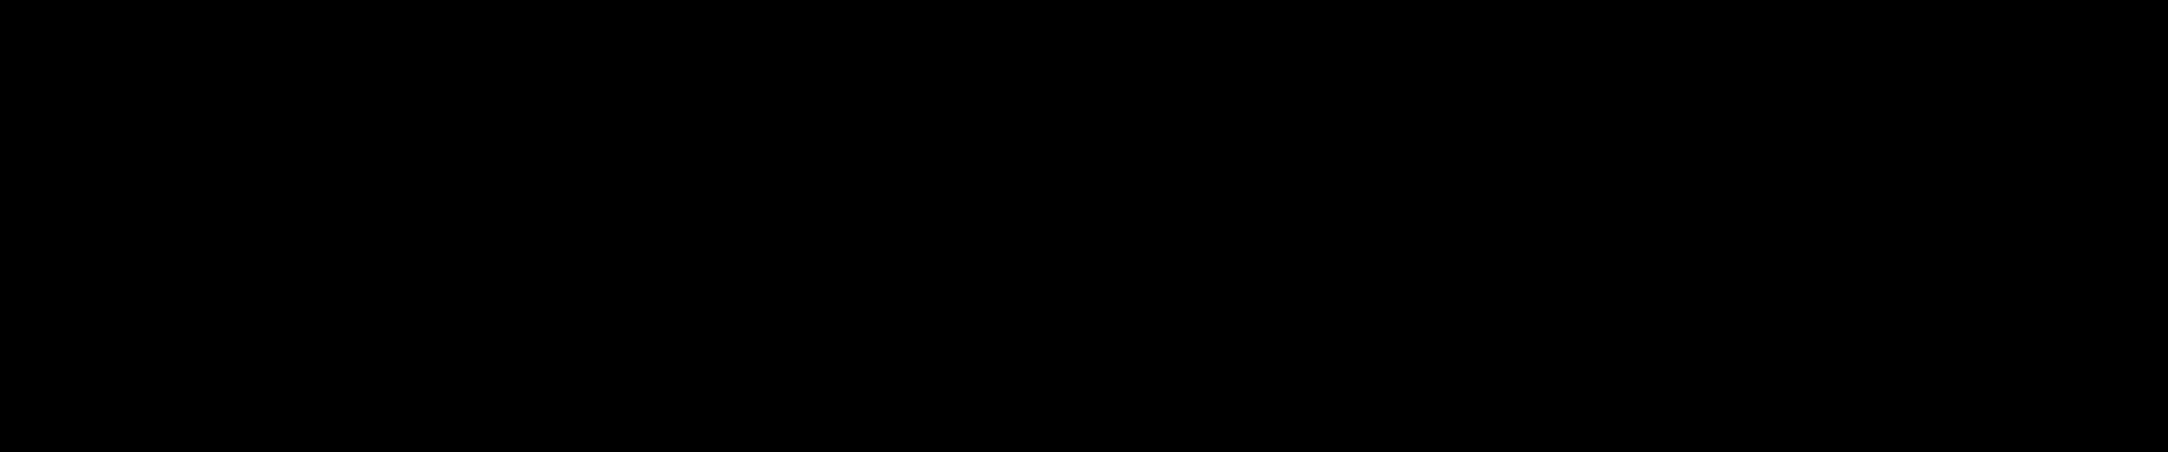 HENNGE Oneのロゴ